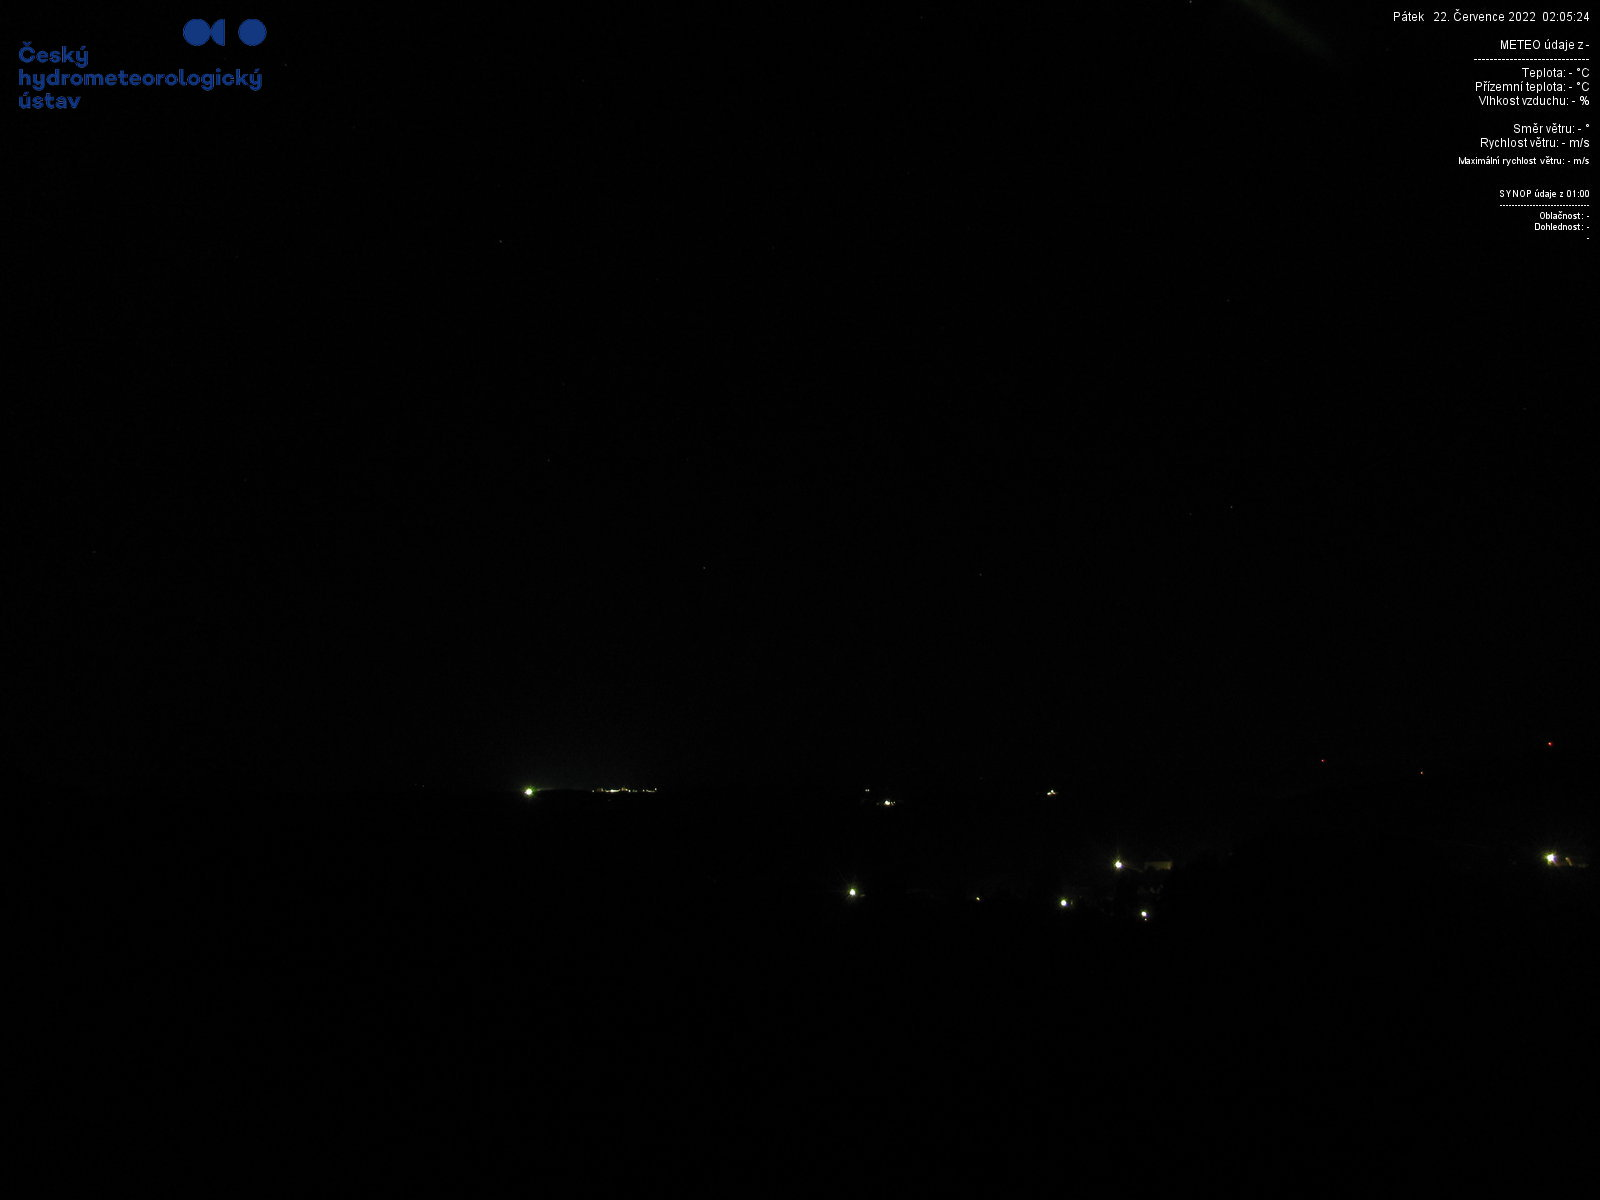 Webcam - Kocelovice